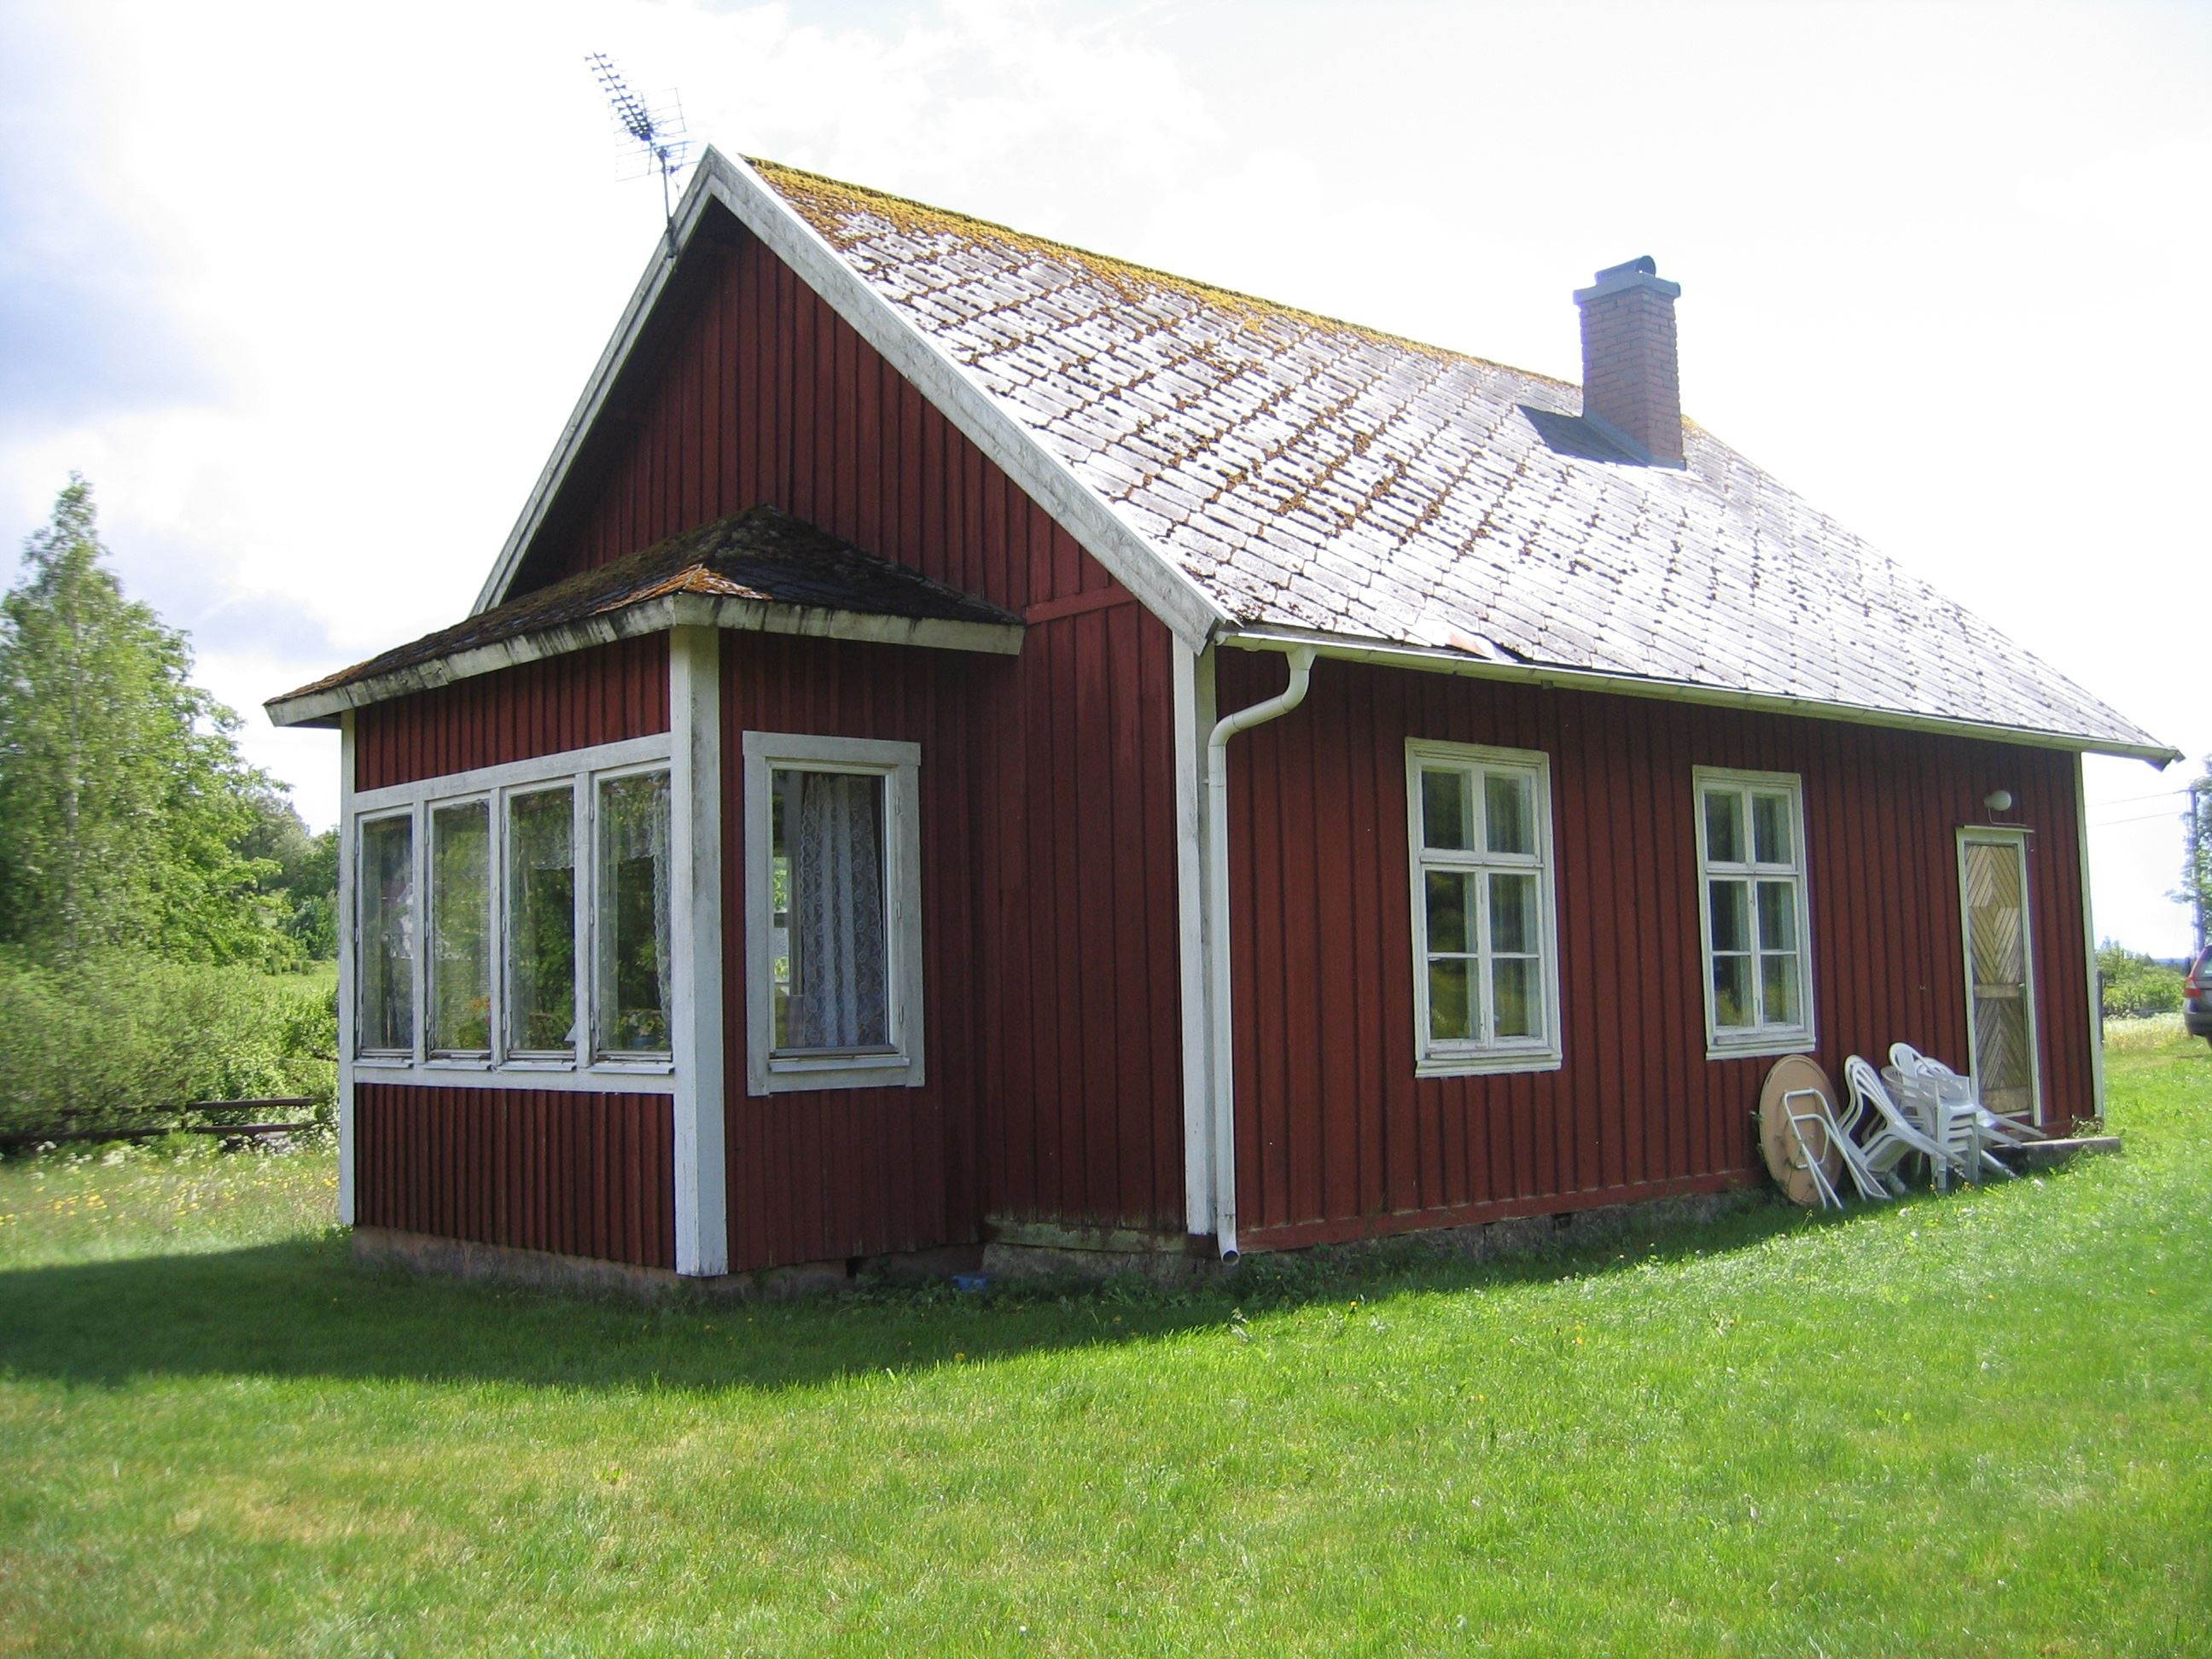 FS85064 Åskog, Korsberga